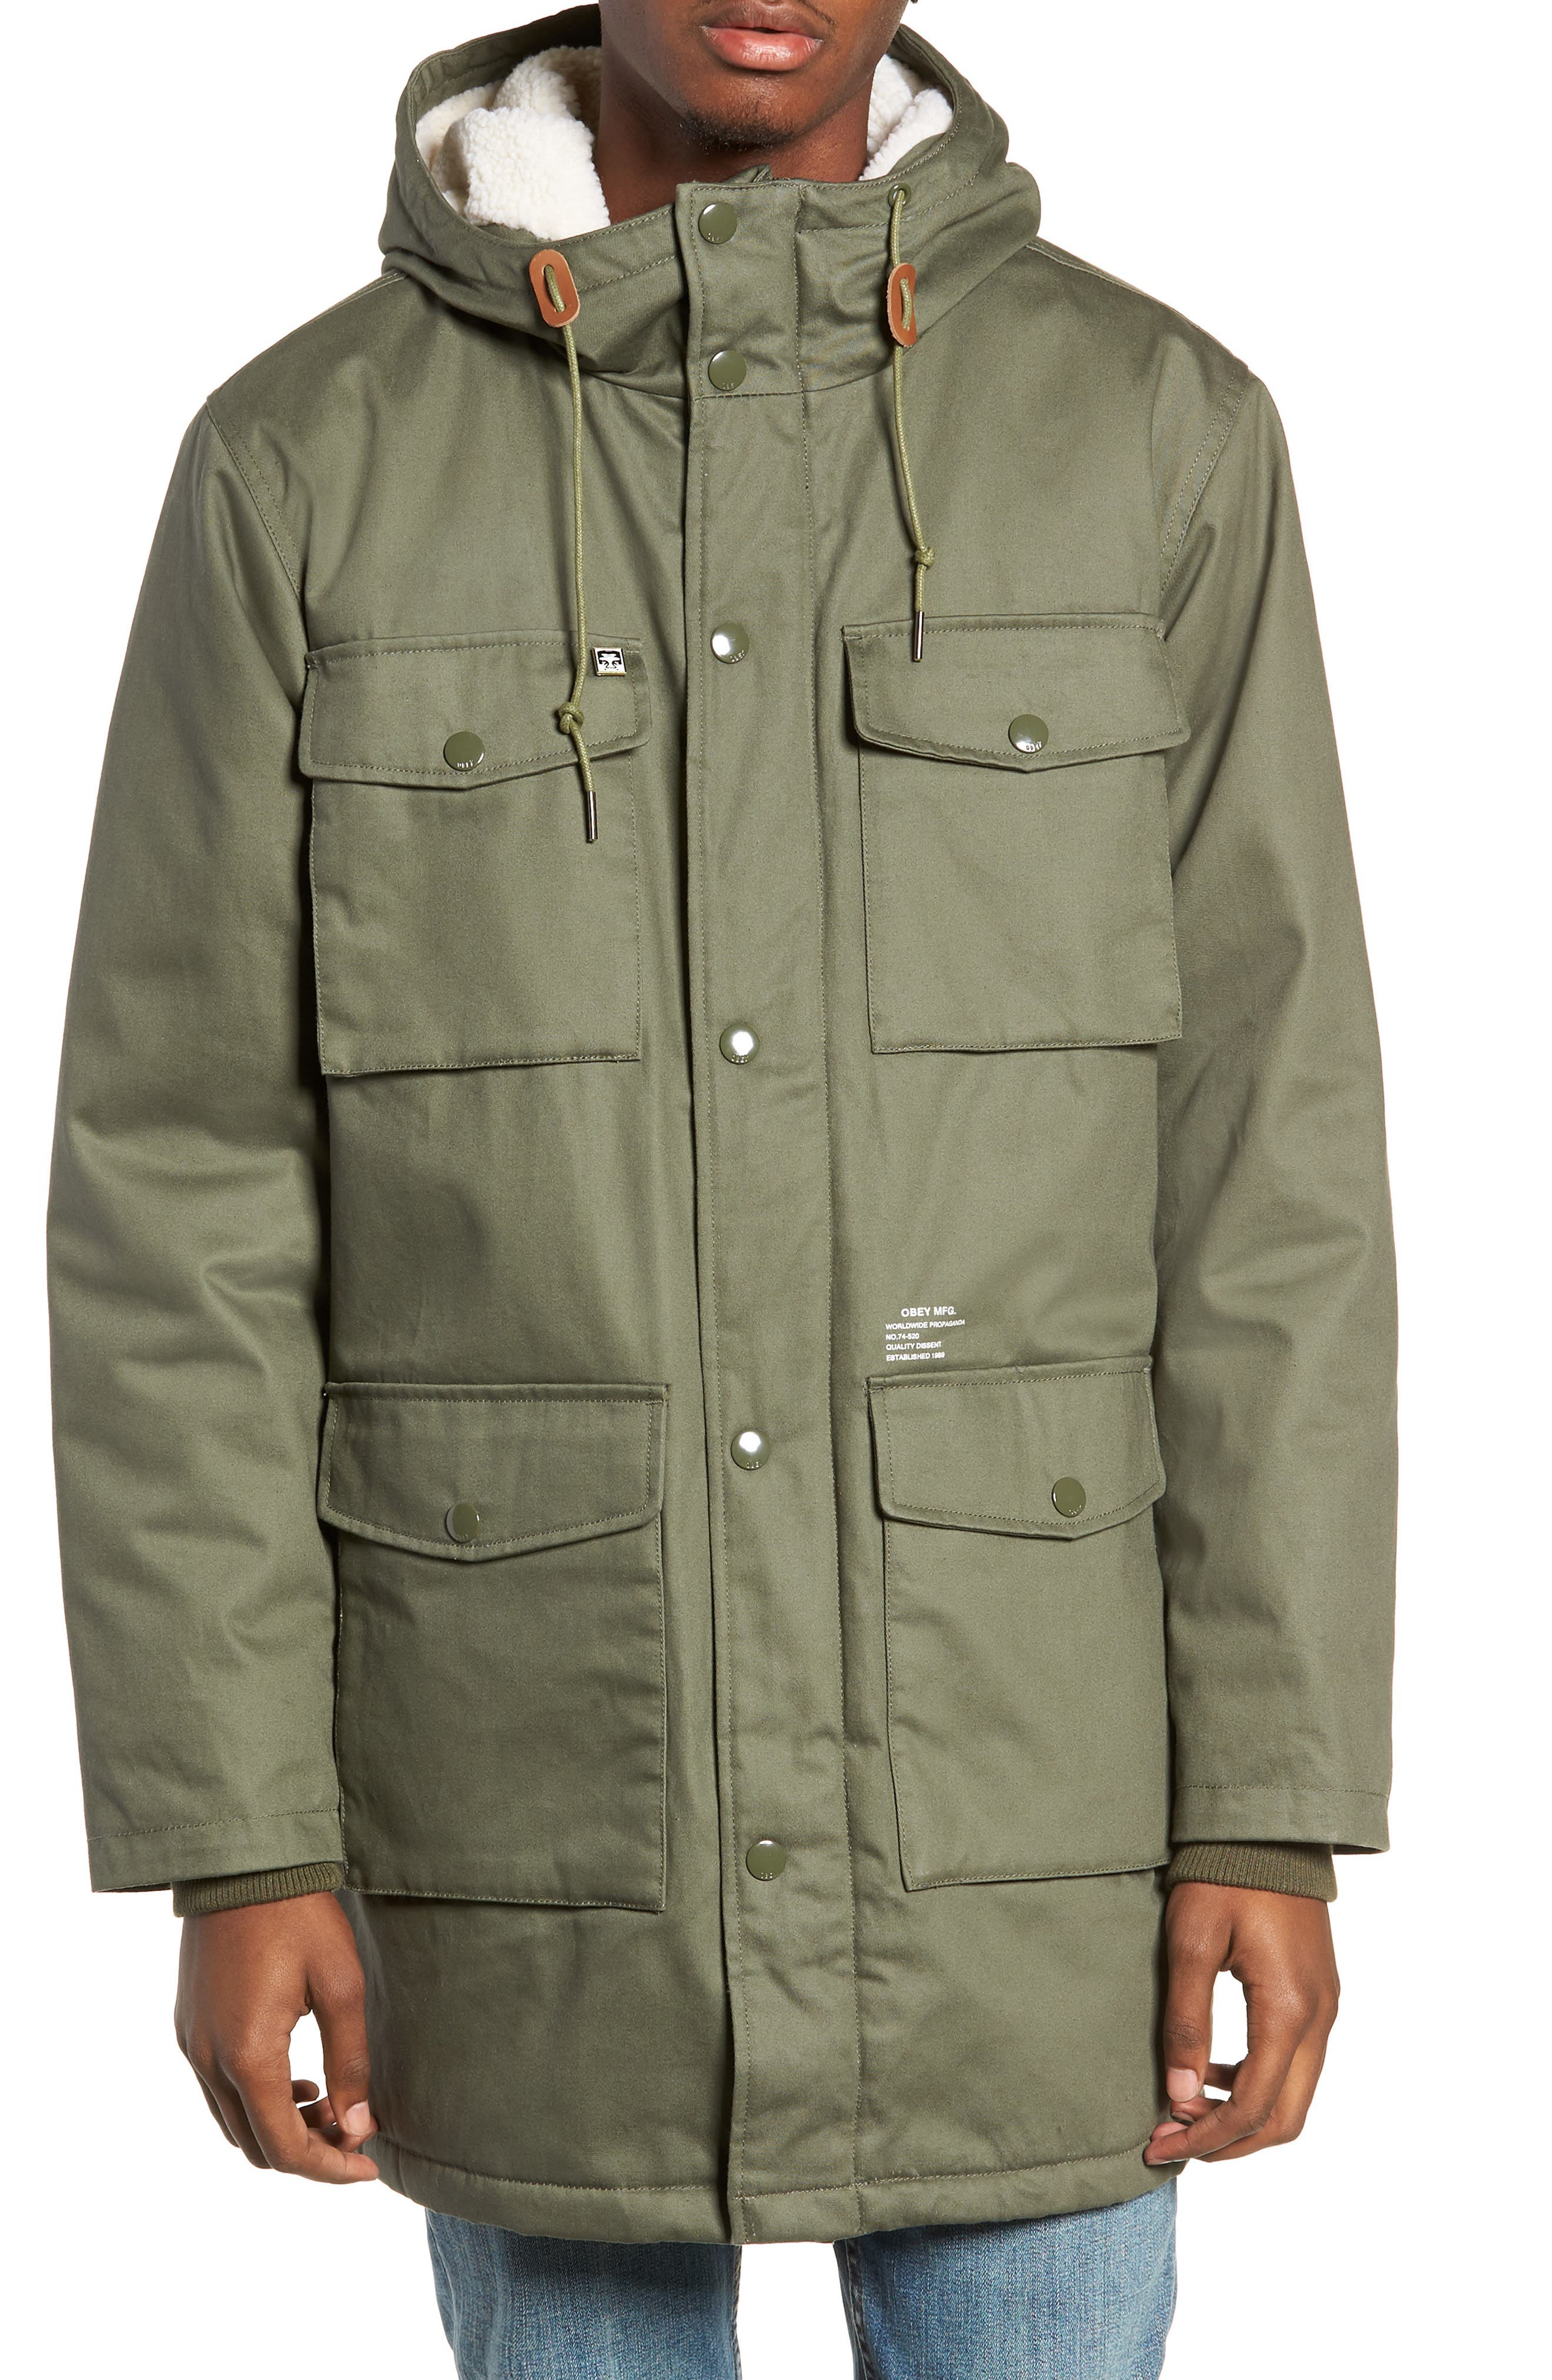 Heller II Jacket,                             Alternate thumbnail 4, color,                             304